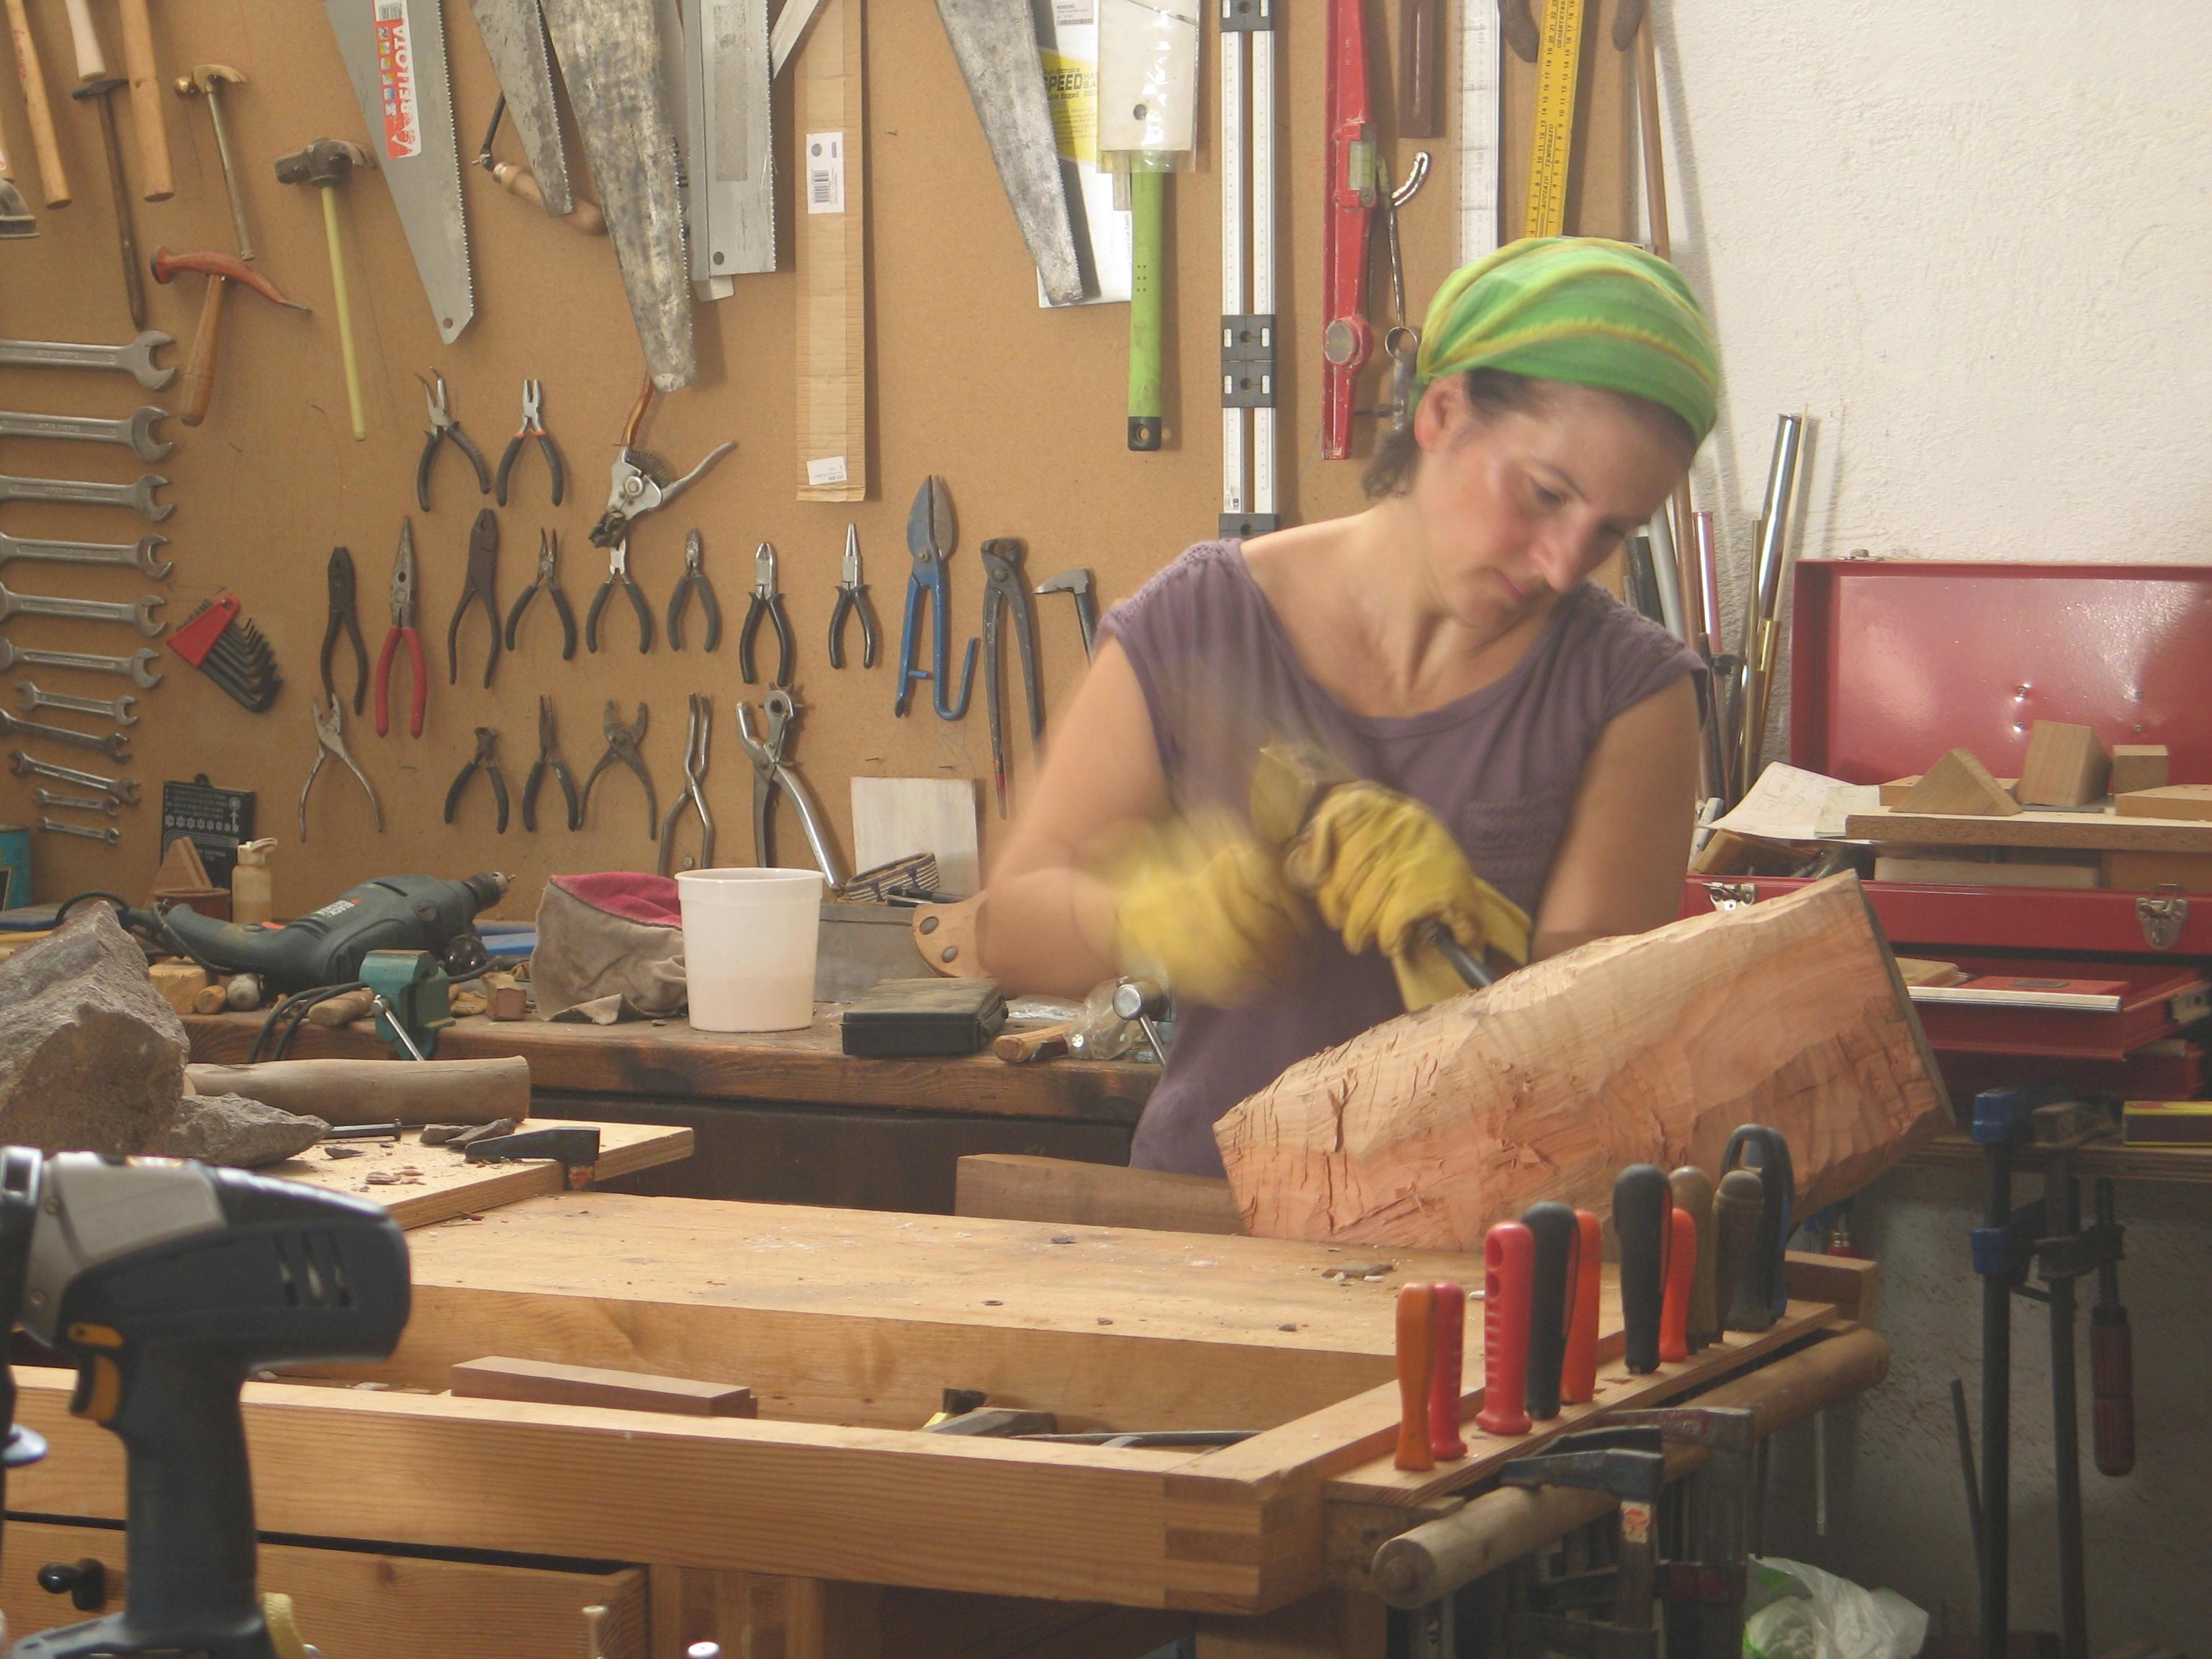 Tallando madera: taller en La isleta PN Cabo de Gata Níjar